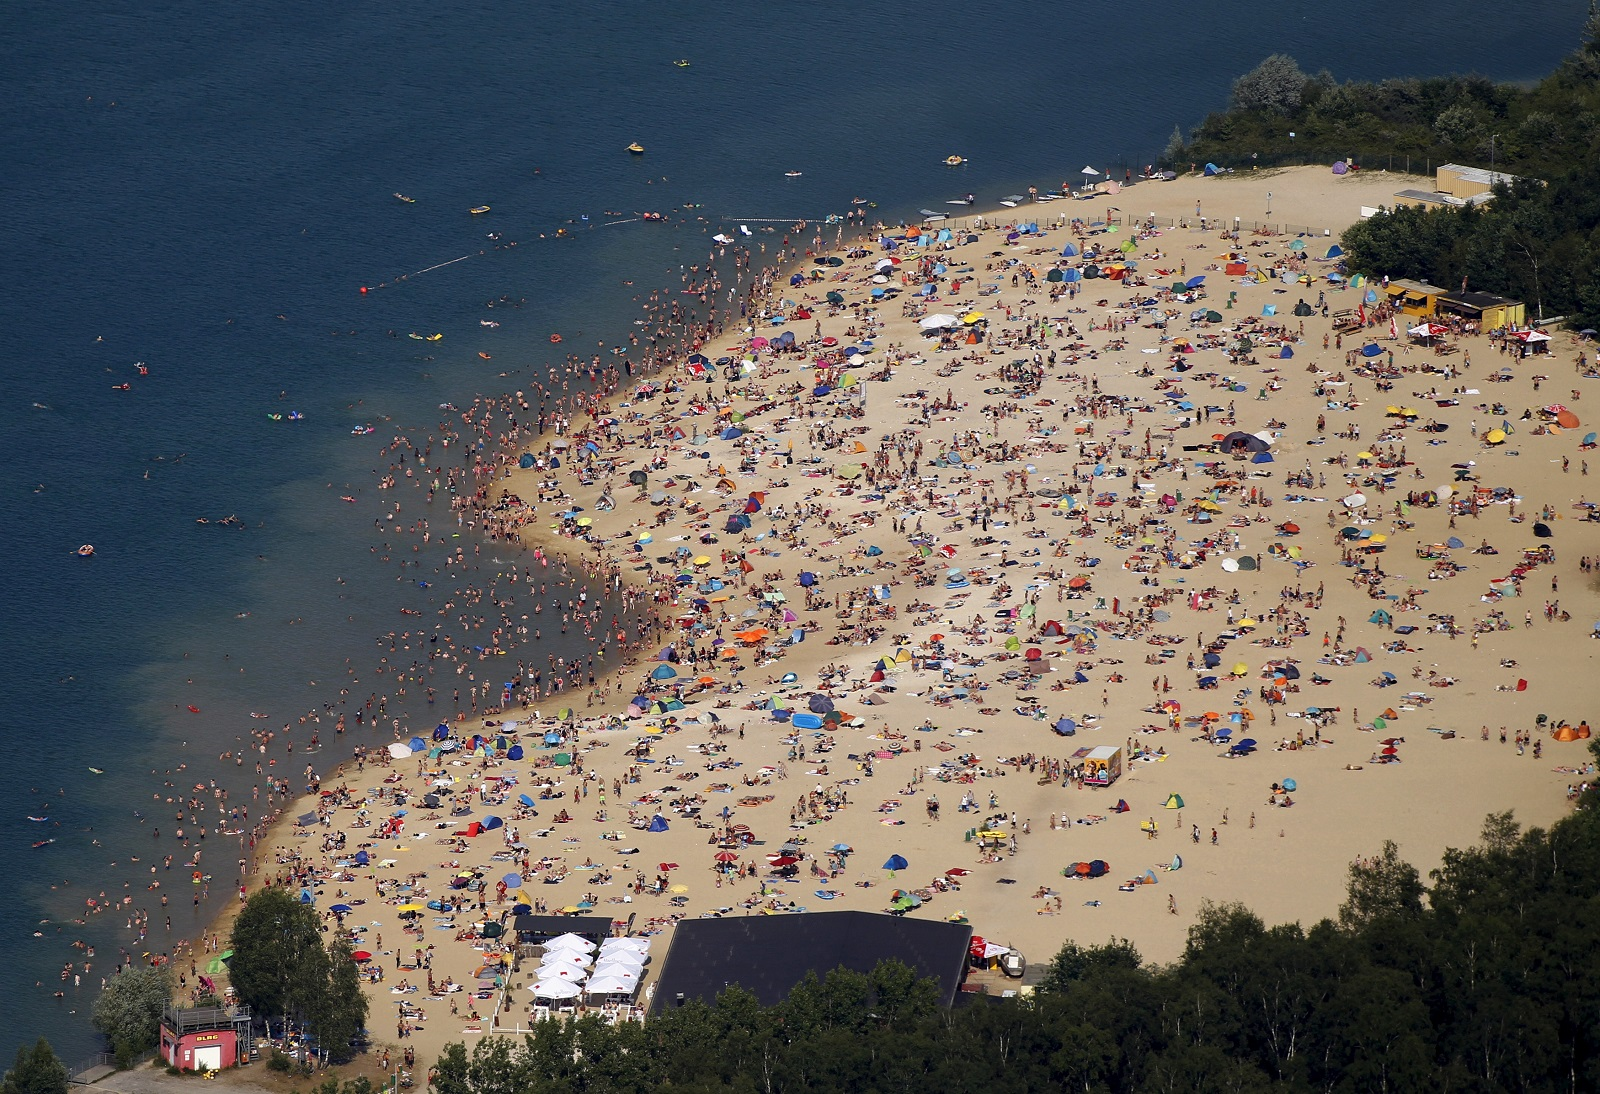 Germany basks in a heatwave